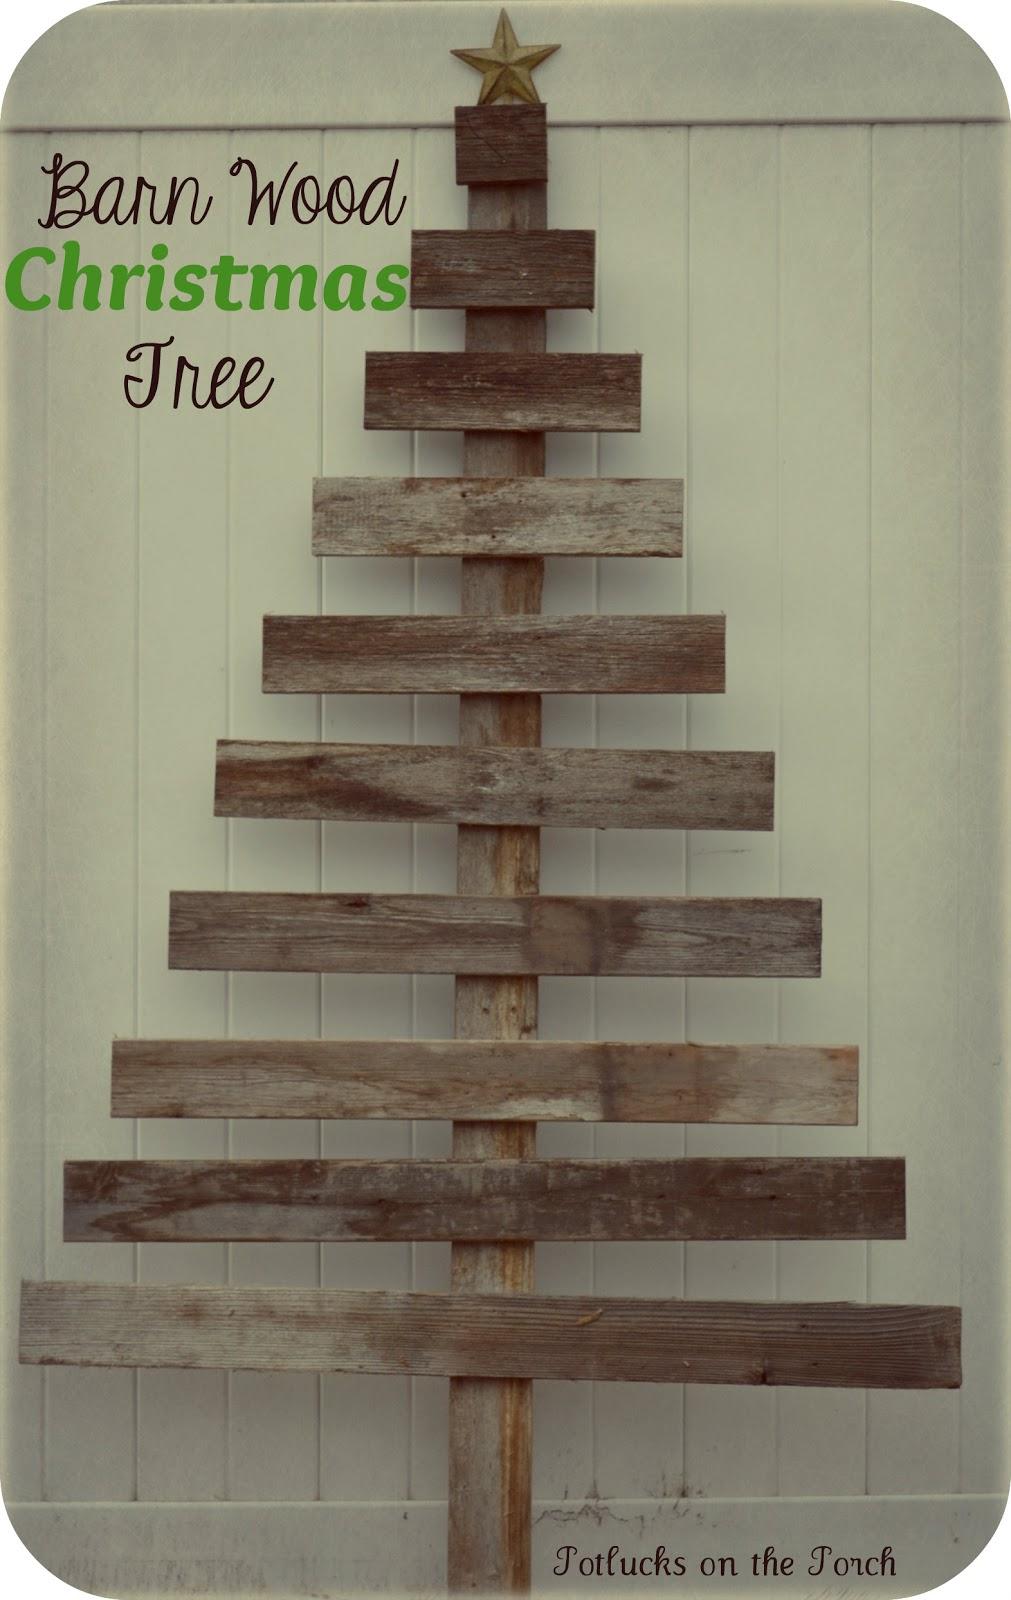 Potlucks on the Porch: Barn Wood Christmas Tree